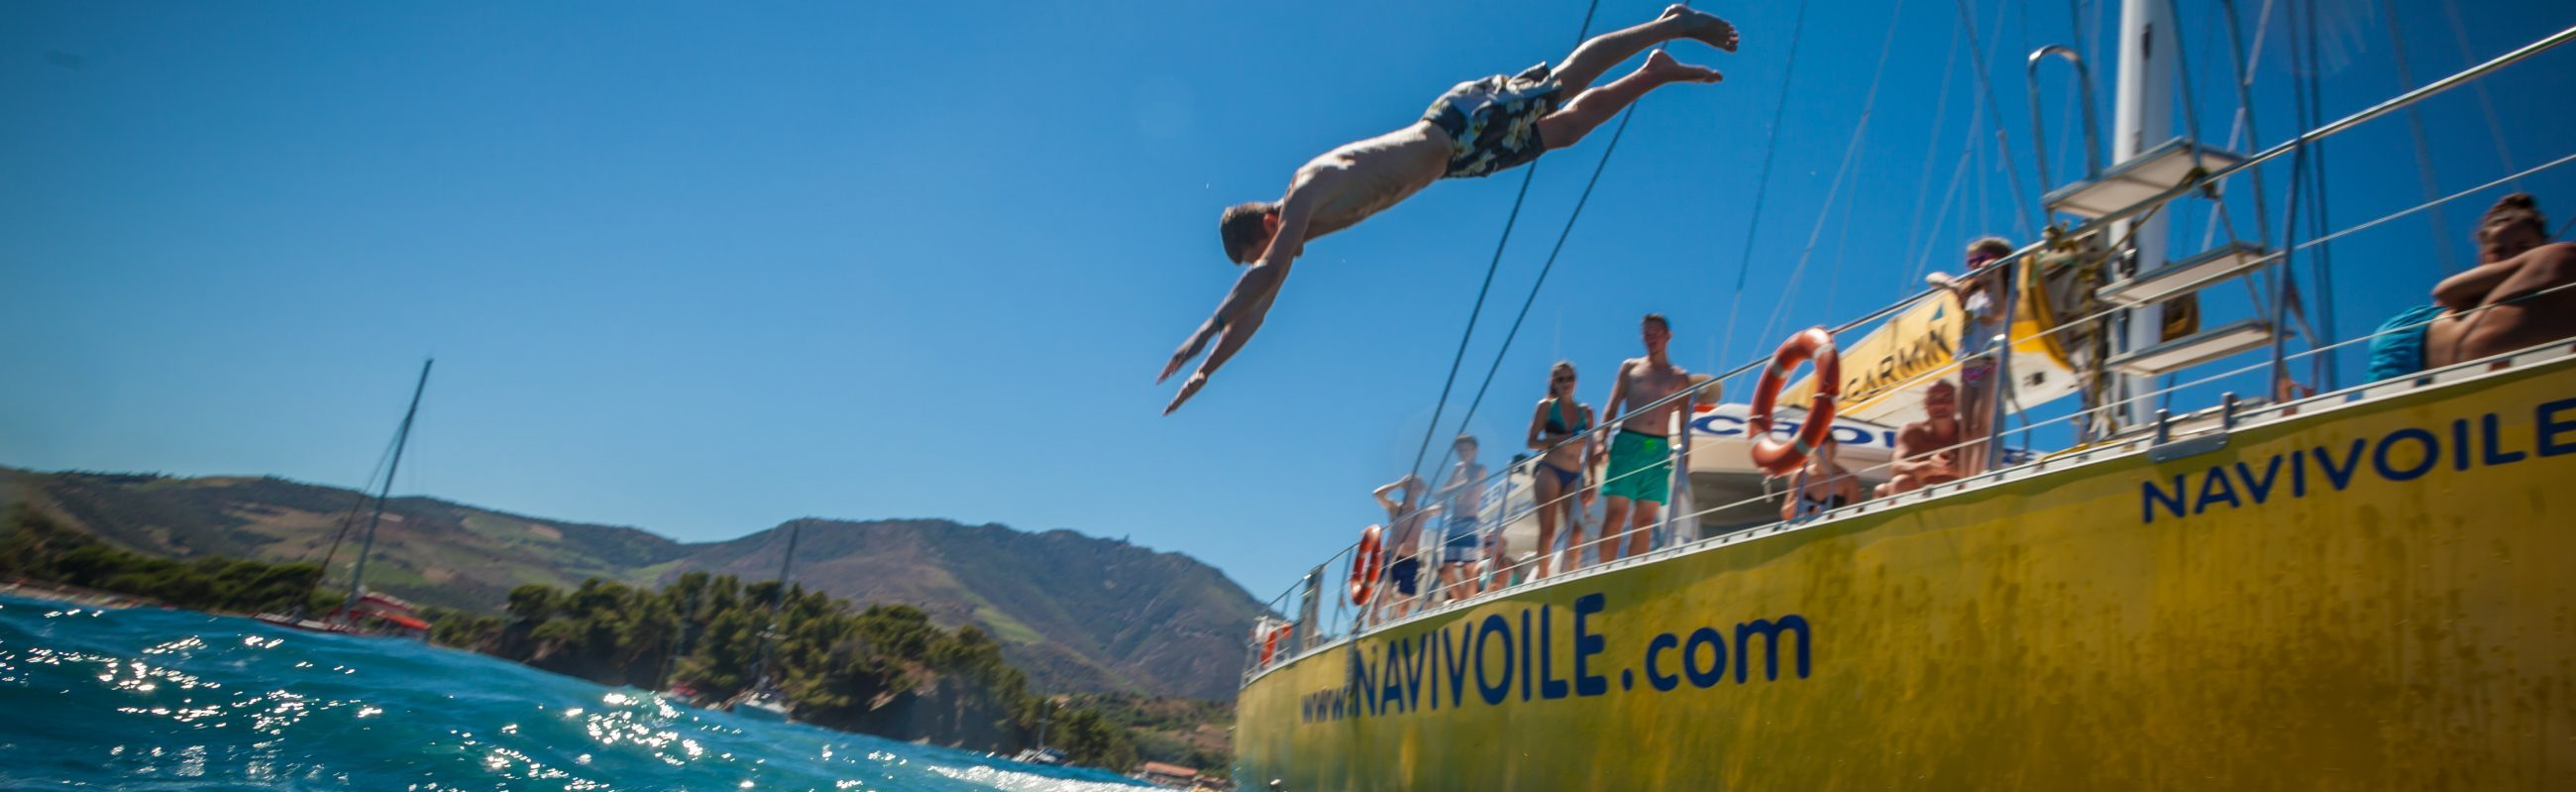 catamaran navivoile plongeon croisiere grillade et baignade baie de paulilles